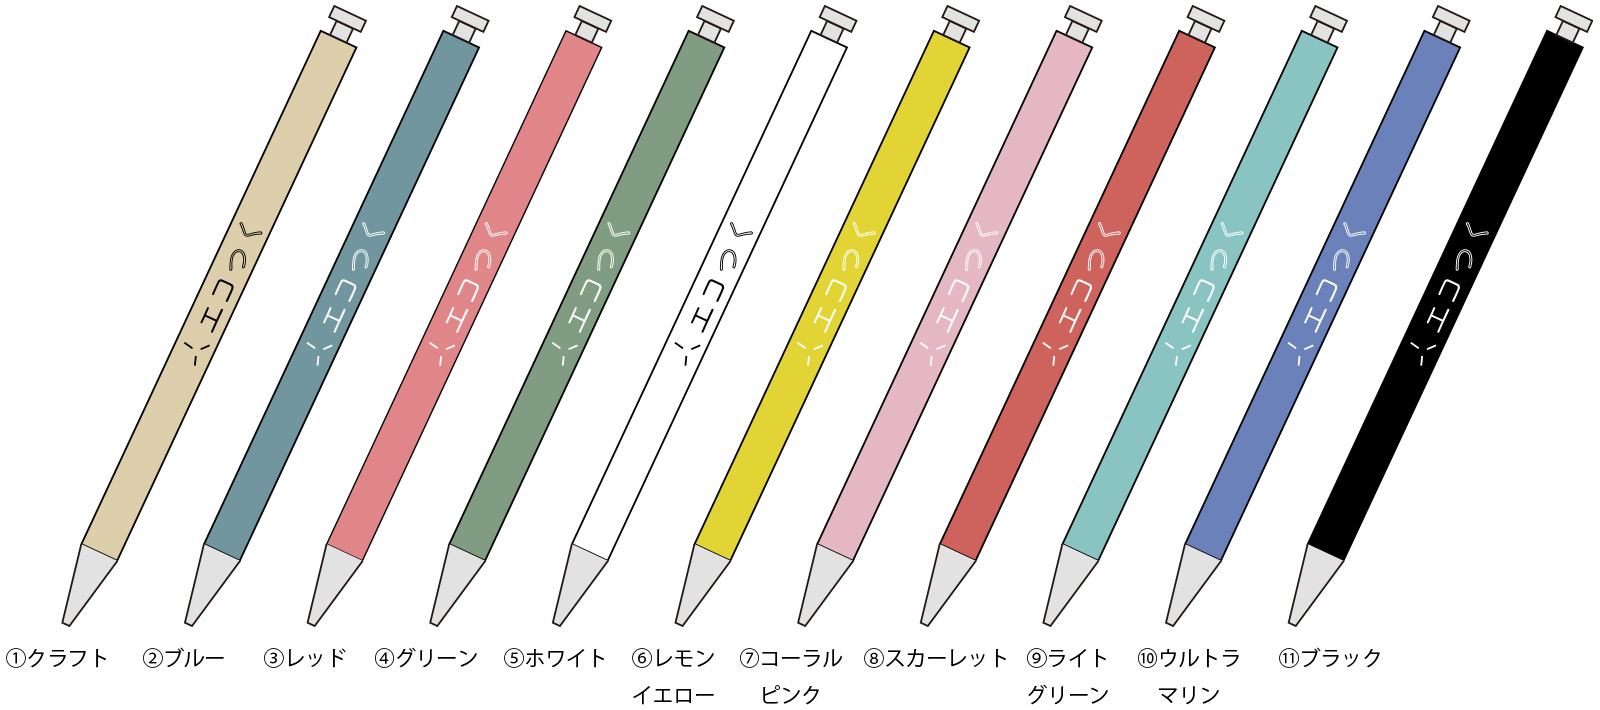 kamipenシャープペン本体色カラー見本